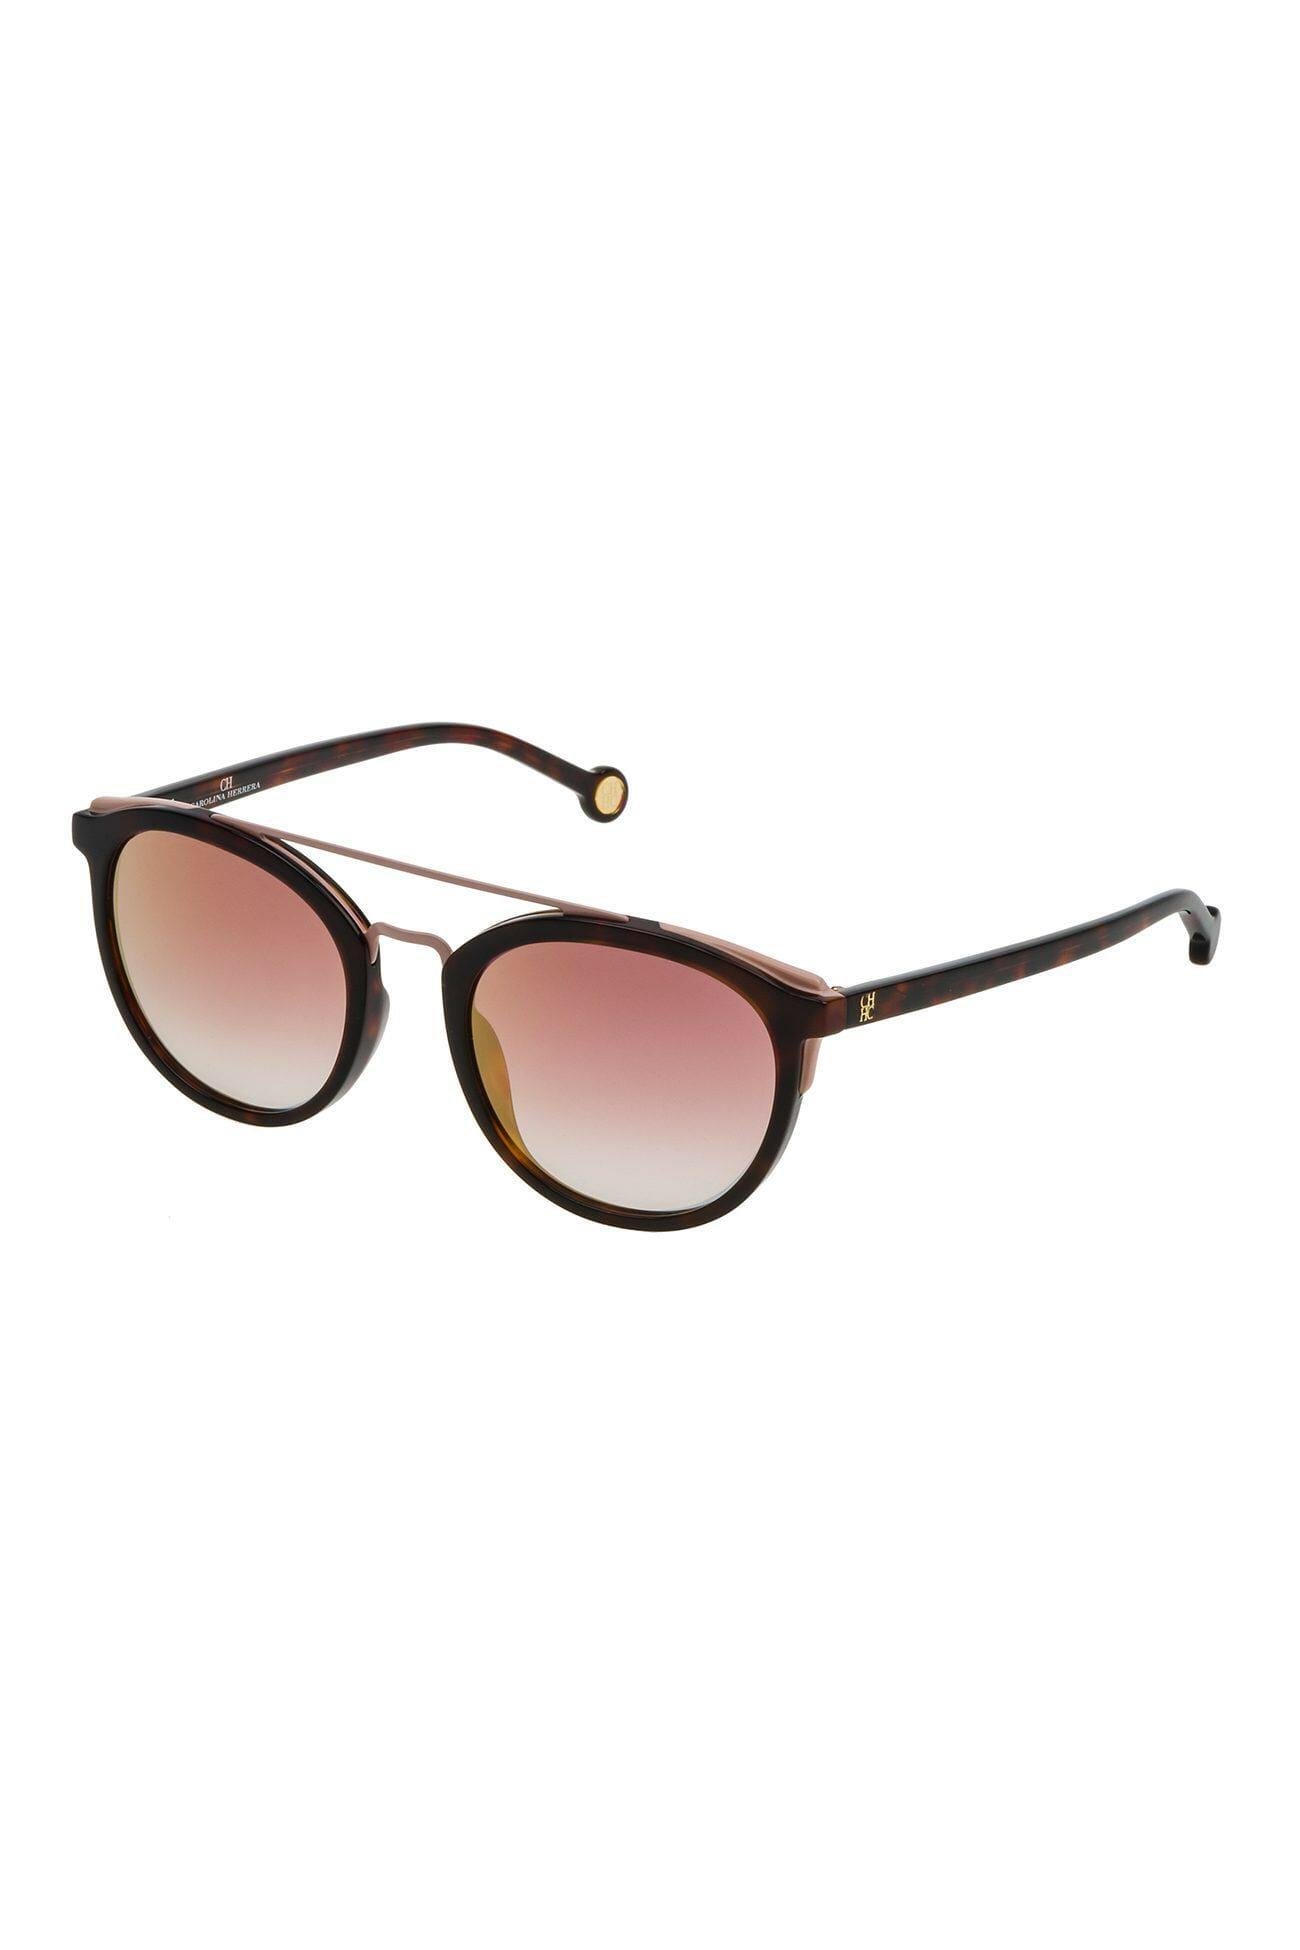 CH-Carolina-Herrera-Eyewear-Reference722G-01